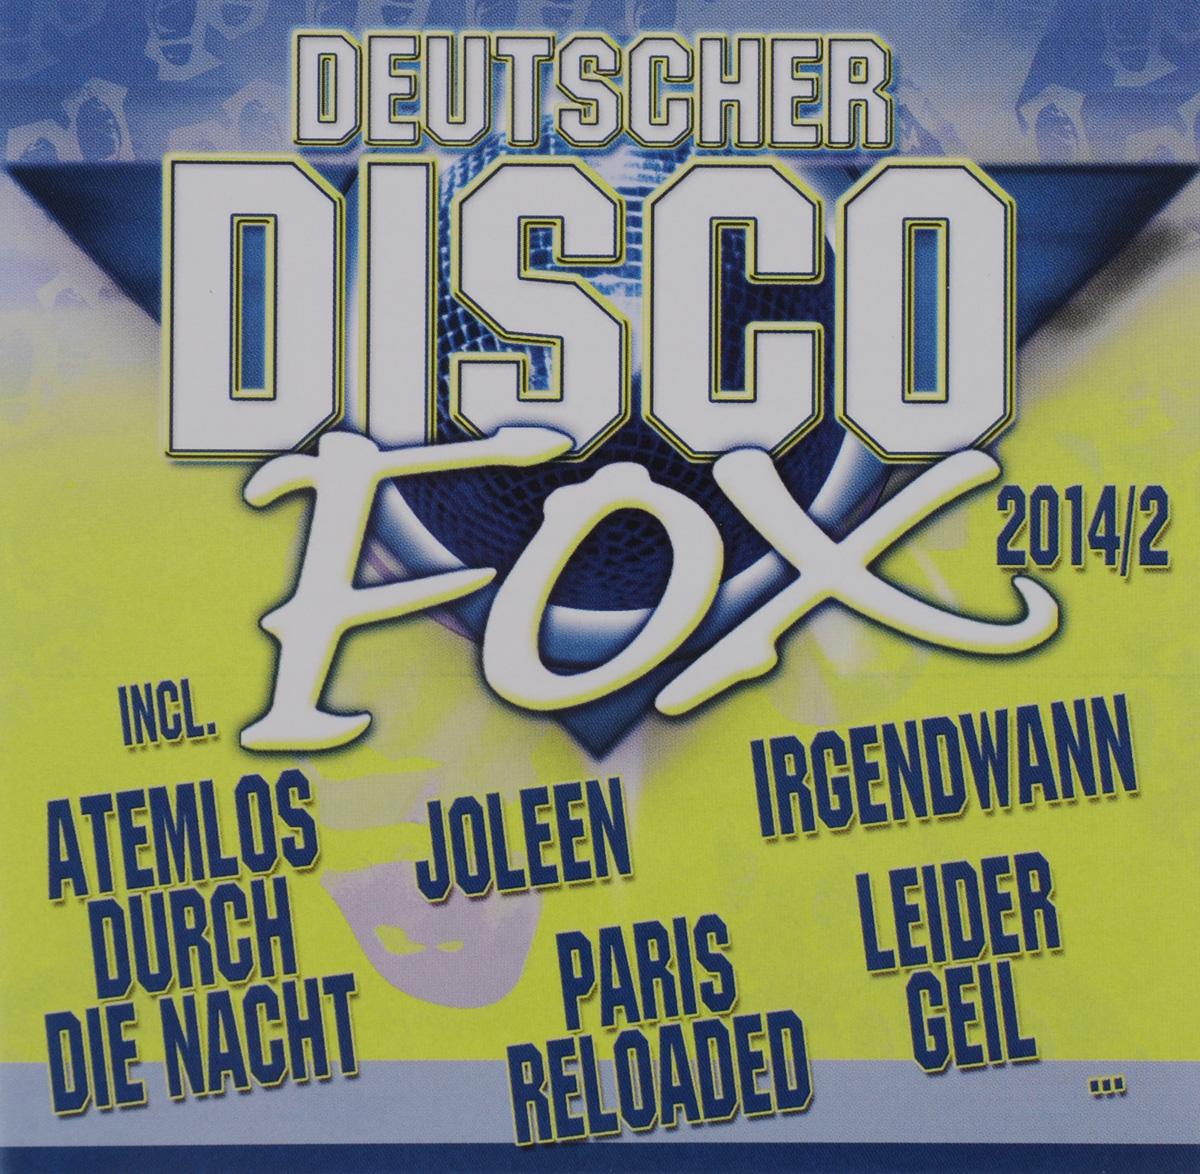 Deutscher Disco Fox 2014/2 (2 CD)